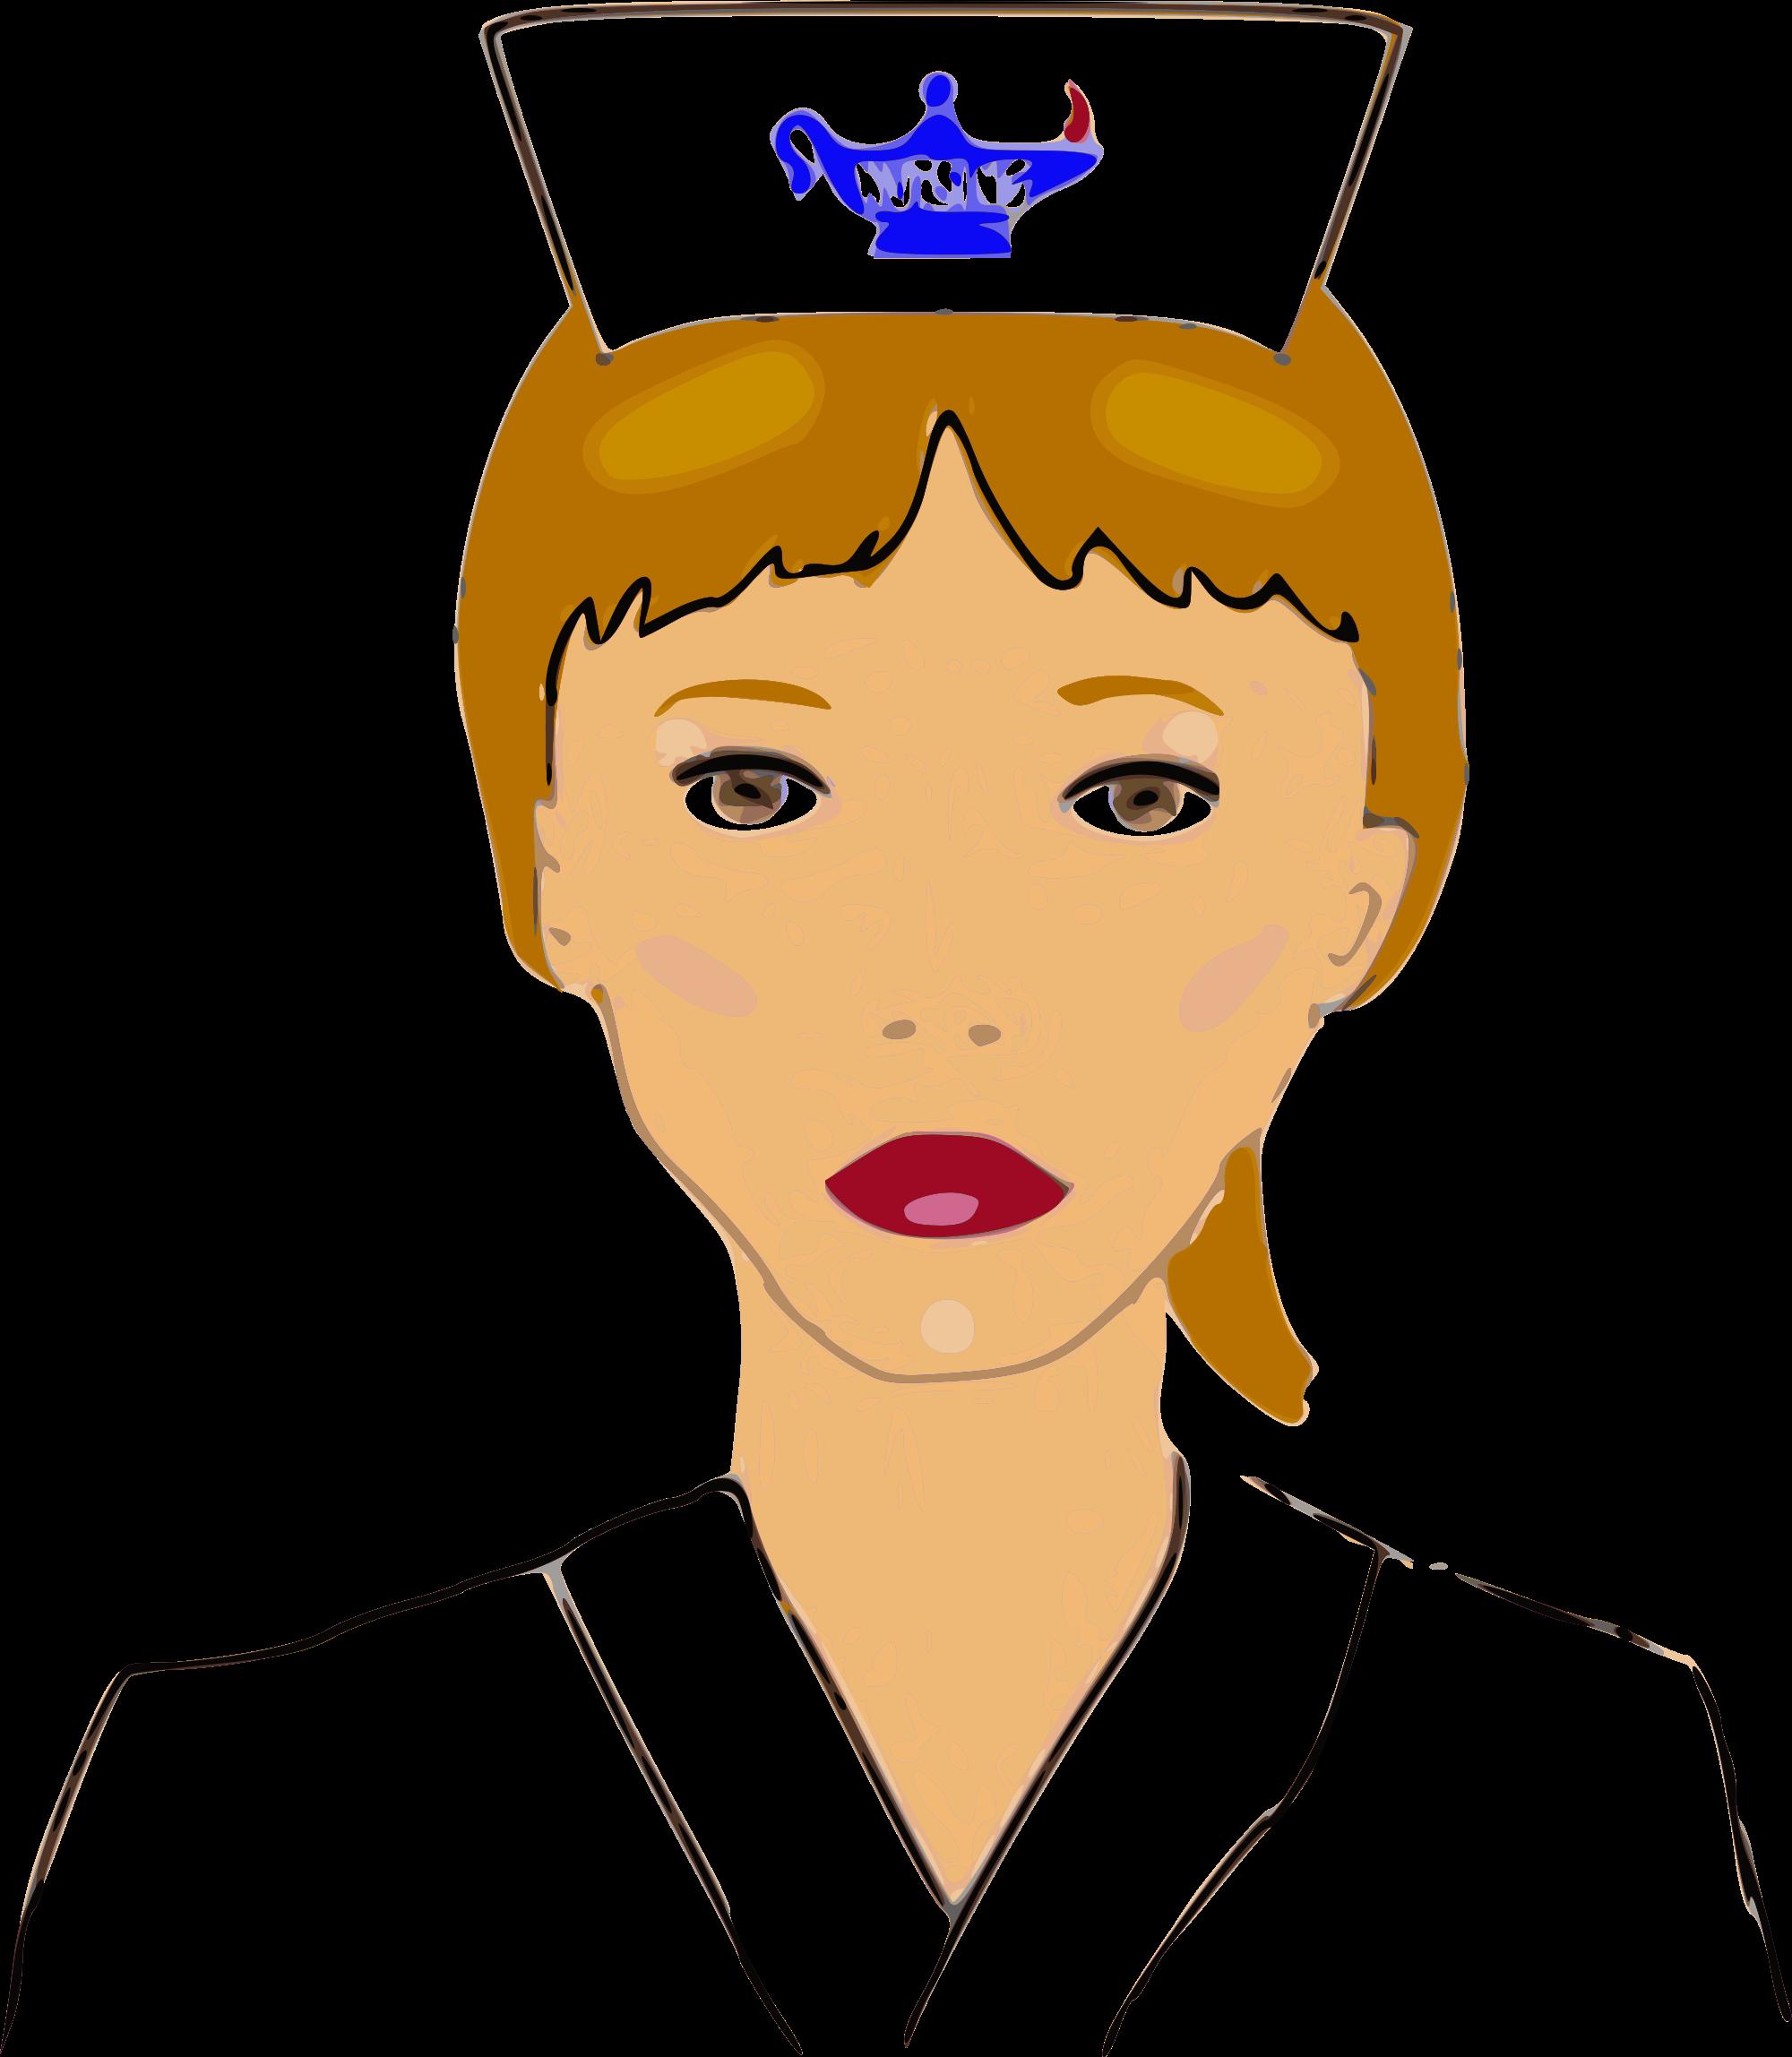 2000x2296 Funny Nurse Clip Art All Graphics Nurse Rn